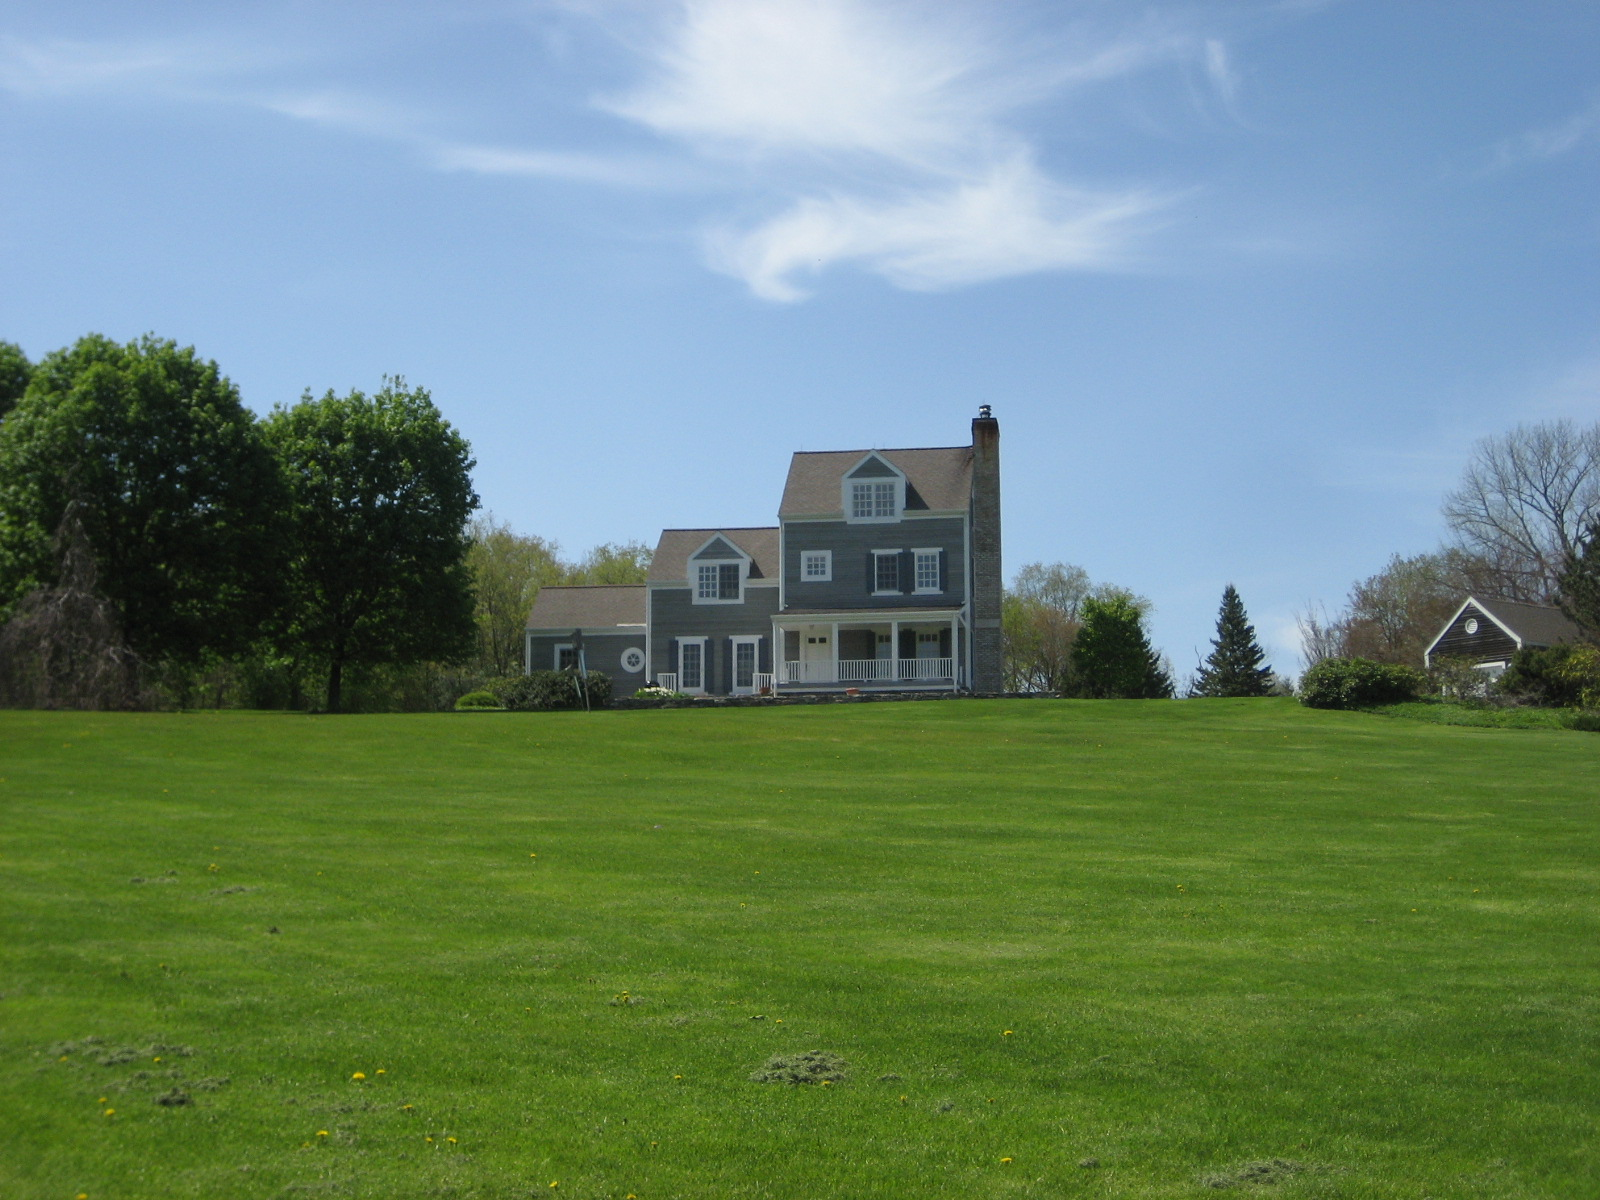 Casa Unifamiliar por un Venta en Rabbit Hill Charmer 26 Rabbit Hill Rd Warren, Connecticut 06777 Estados Unidos